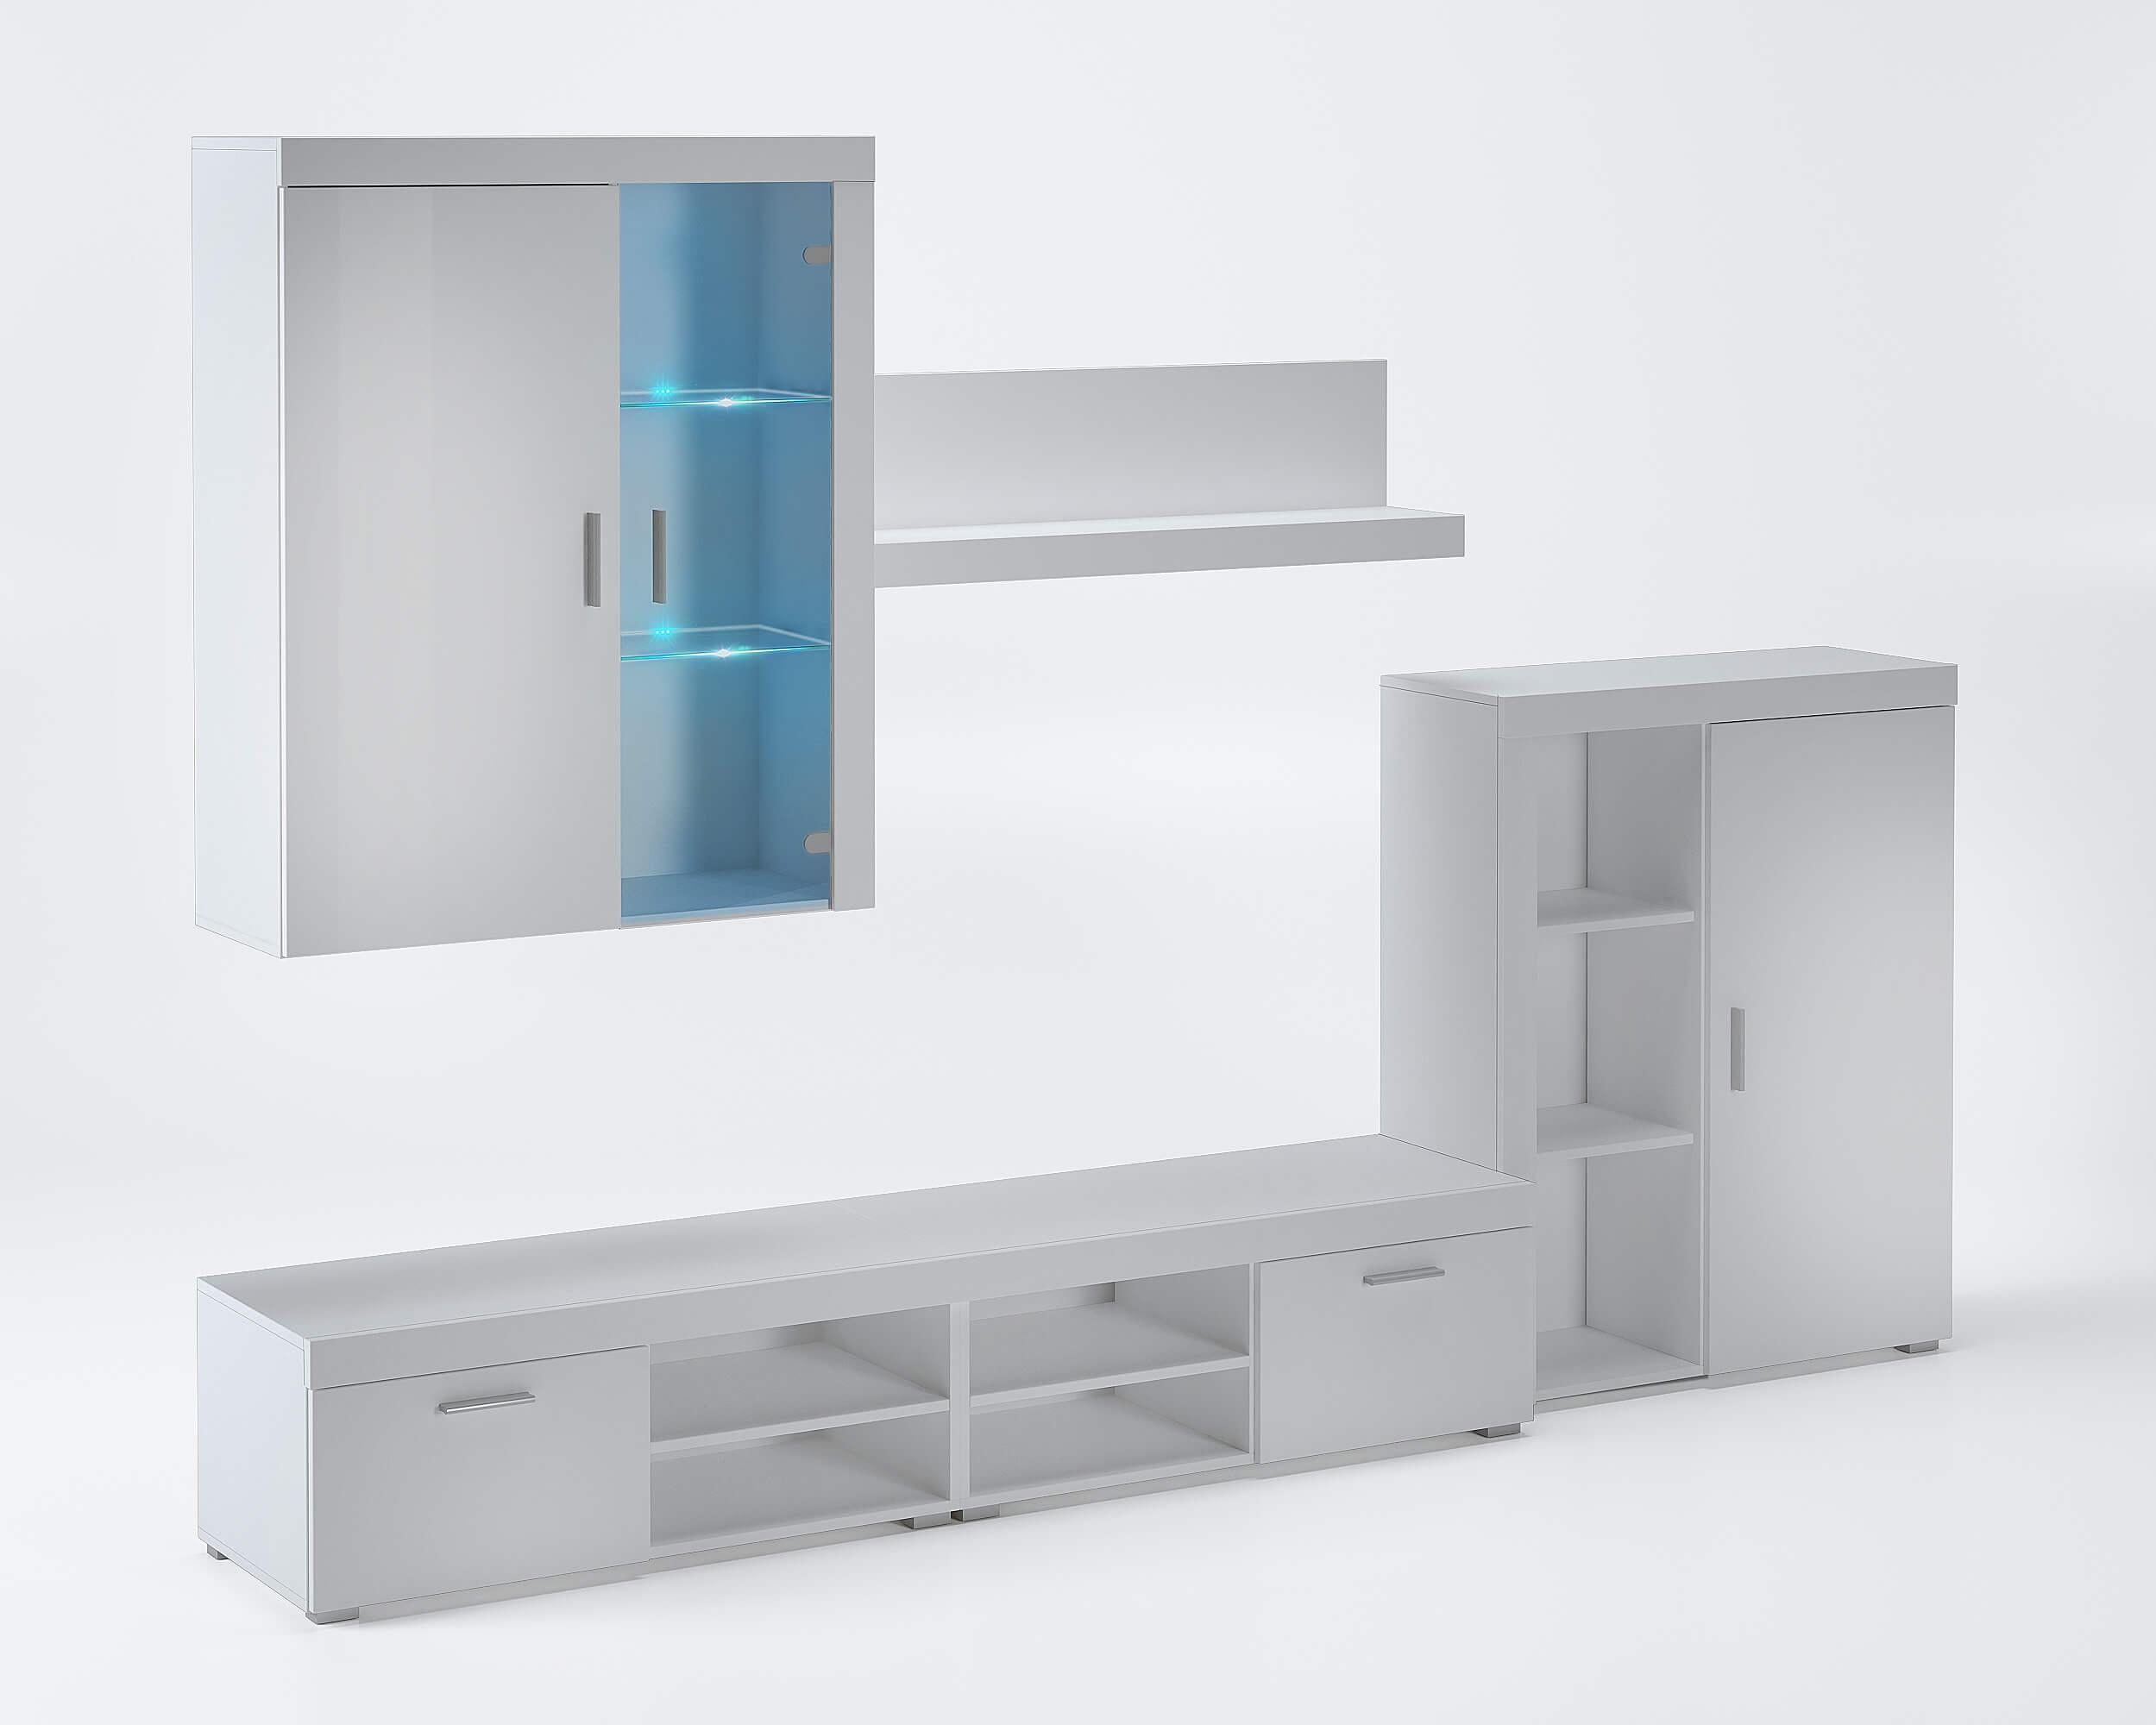 ensemble de meubles meuble tv ilumin led blanc laque blanc mate 290x200x45cm